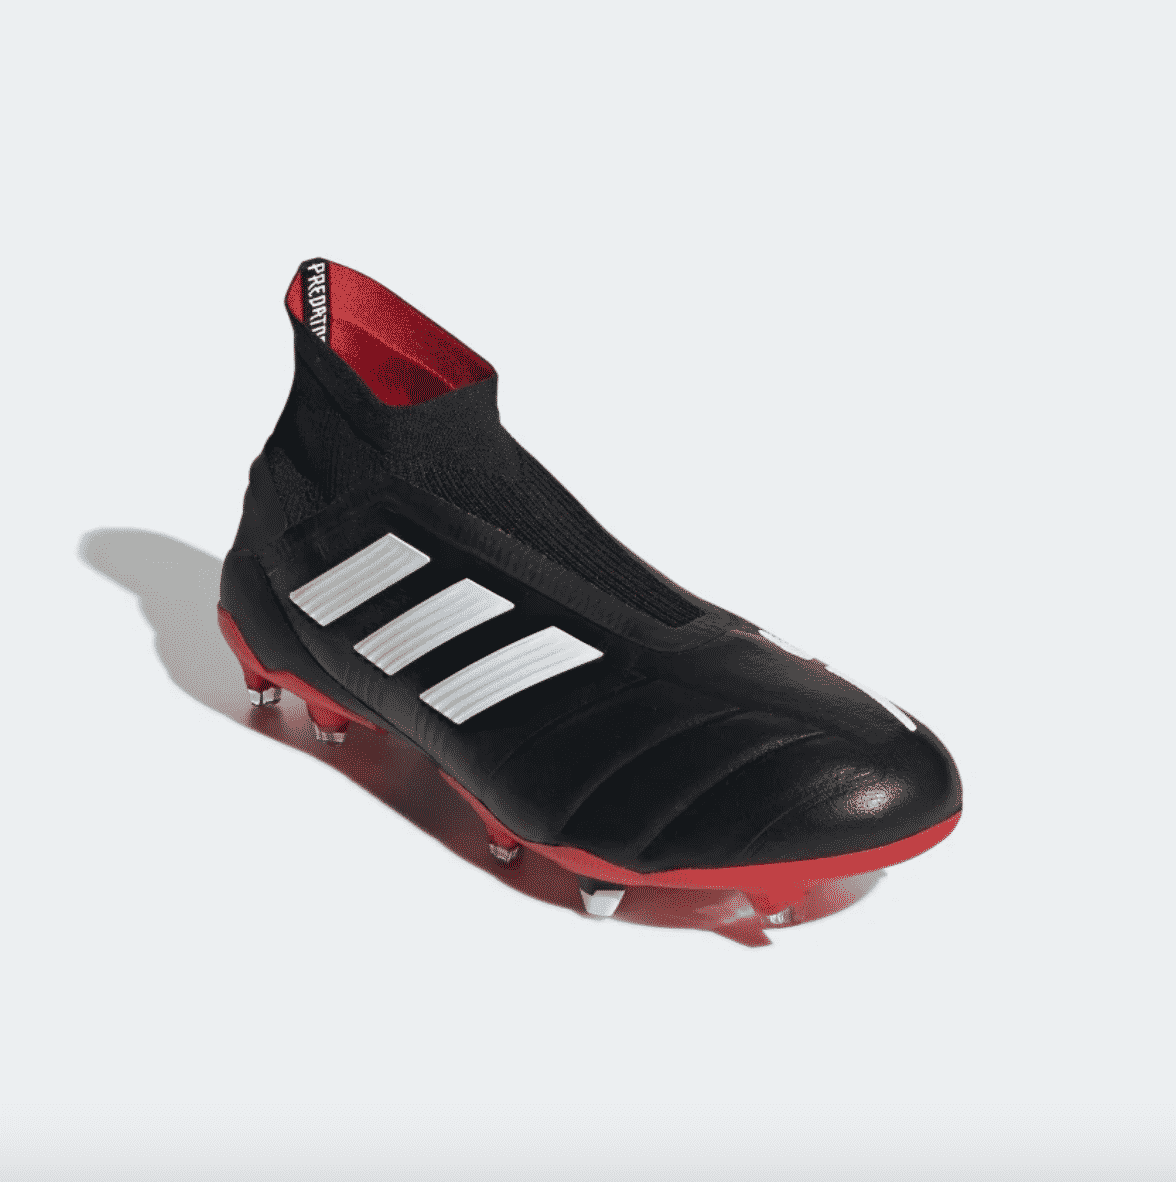 adidas-predator-19+-reedition-predator-mania-noir-4